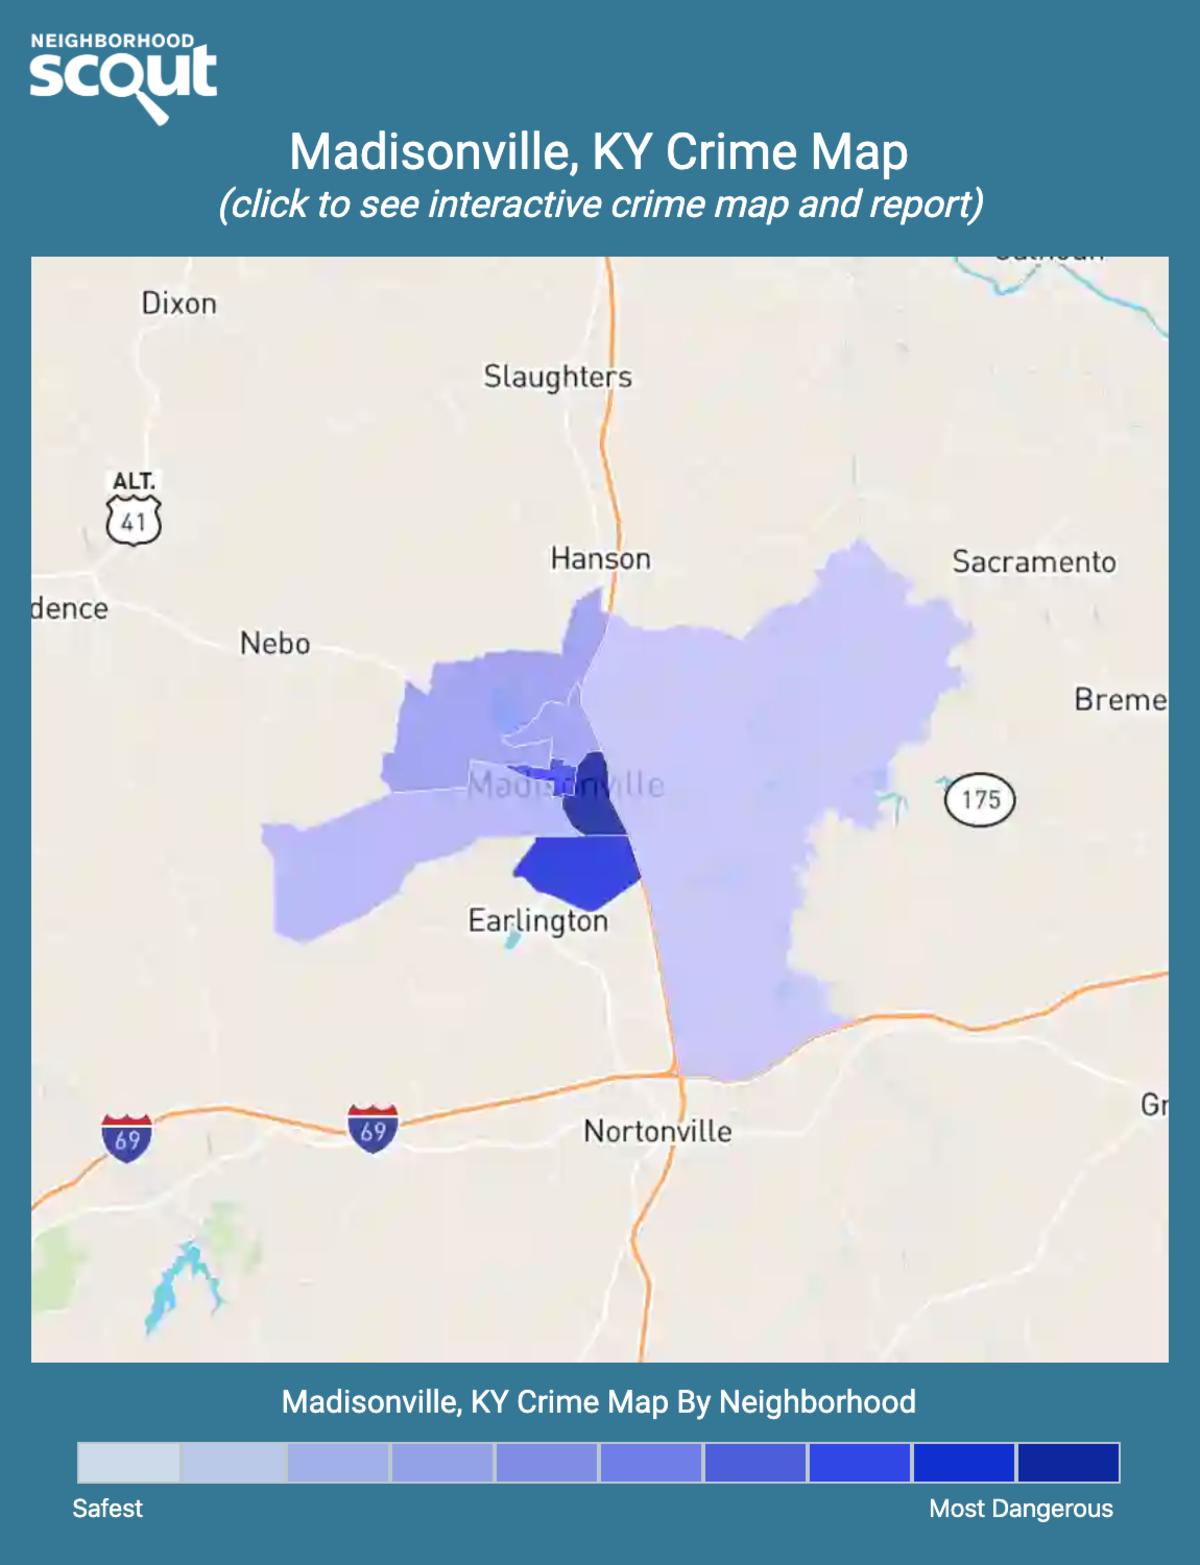 Madisonville, Kentucky crime map